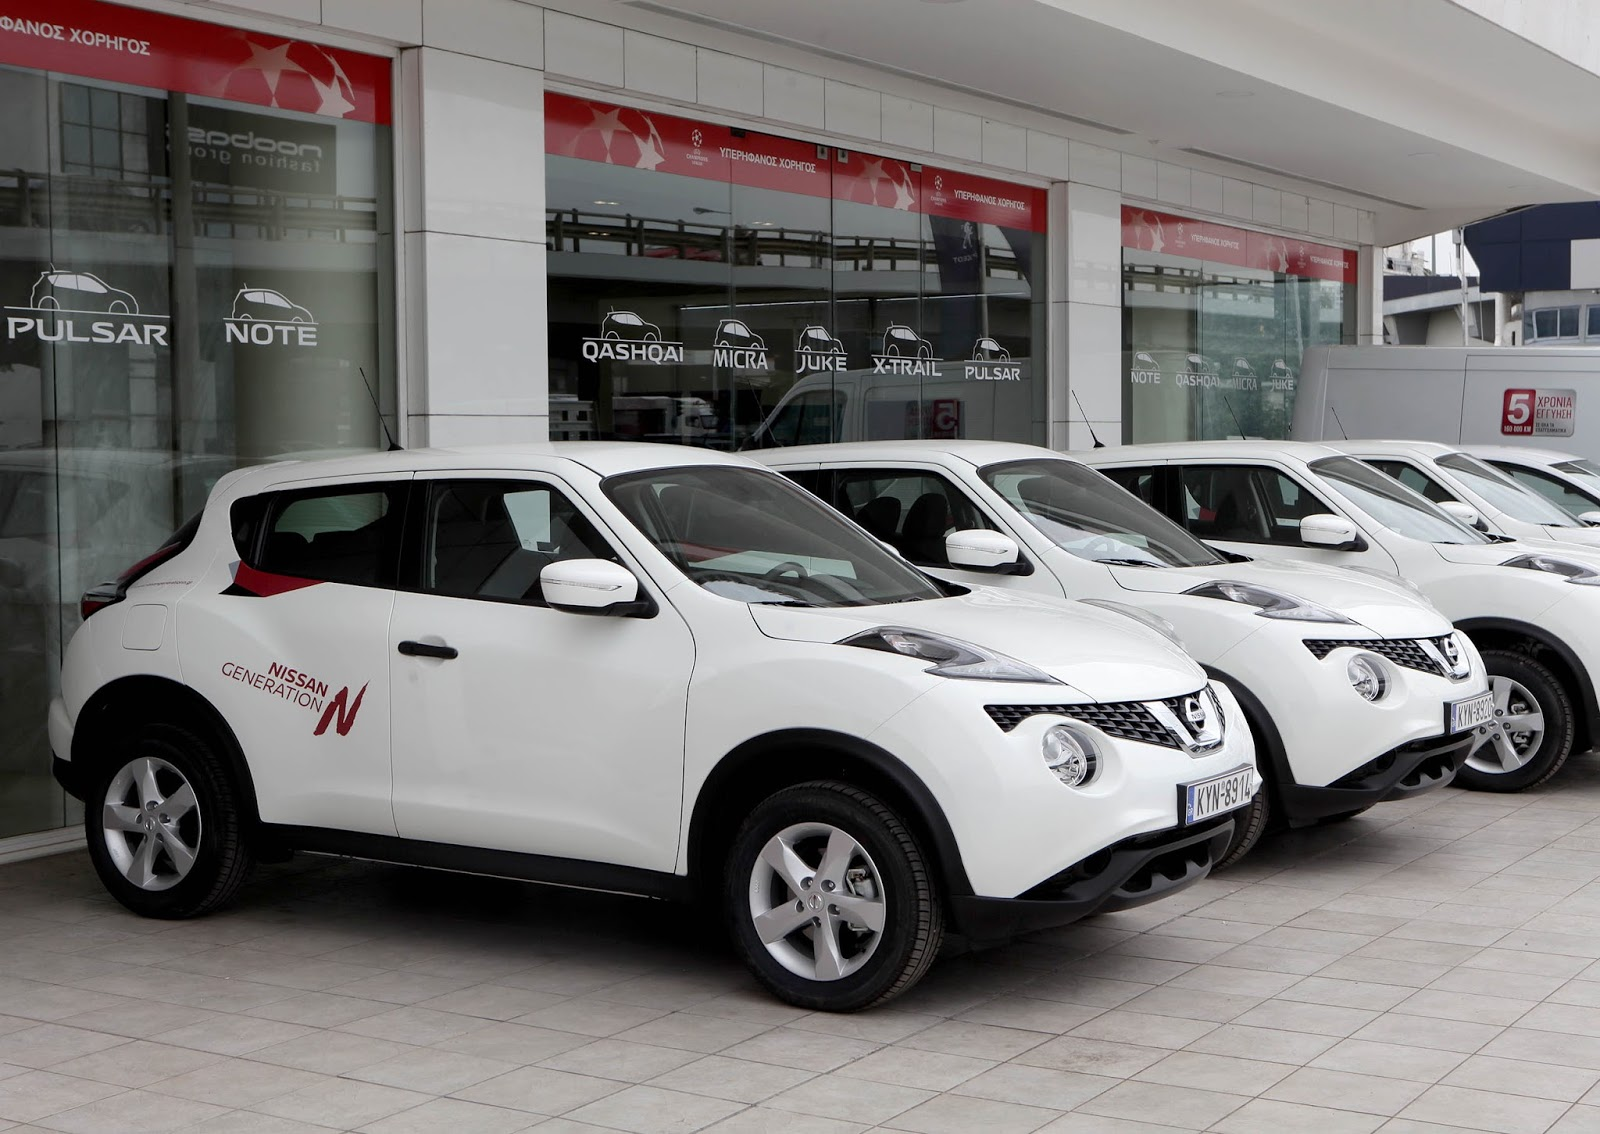 IMG 5886 Η Nissan βραβεύει με αυτοκίνητα του νικητές του GENERATION N ! Events, Future, Innovation, Nissan